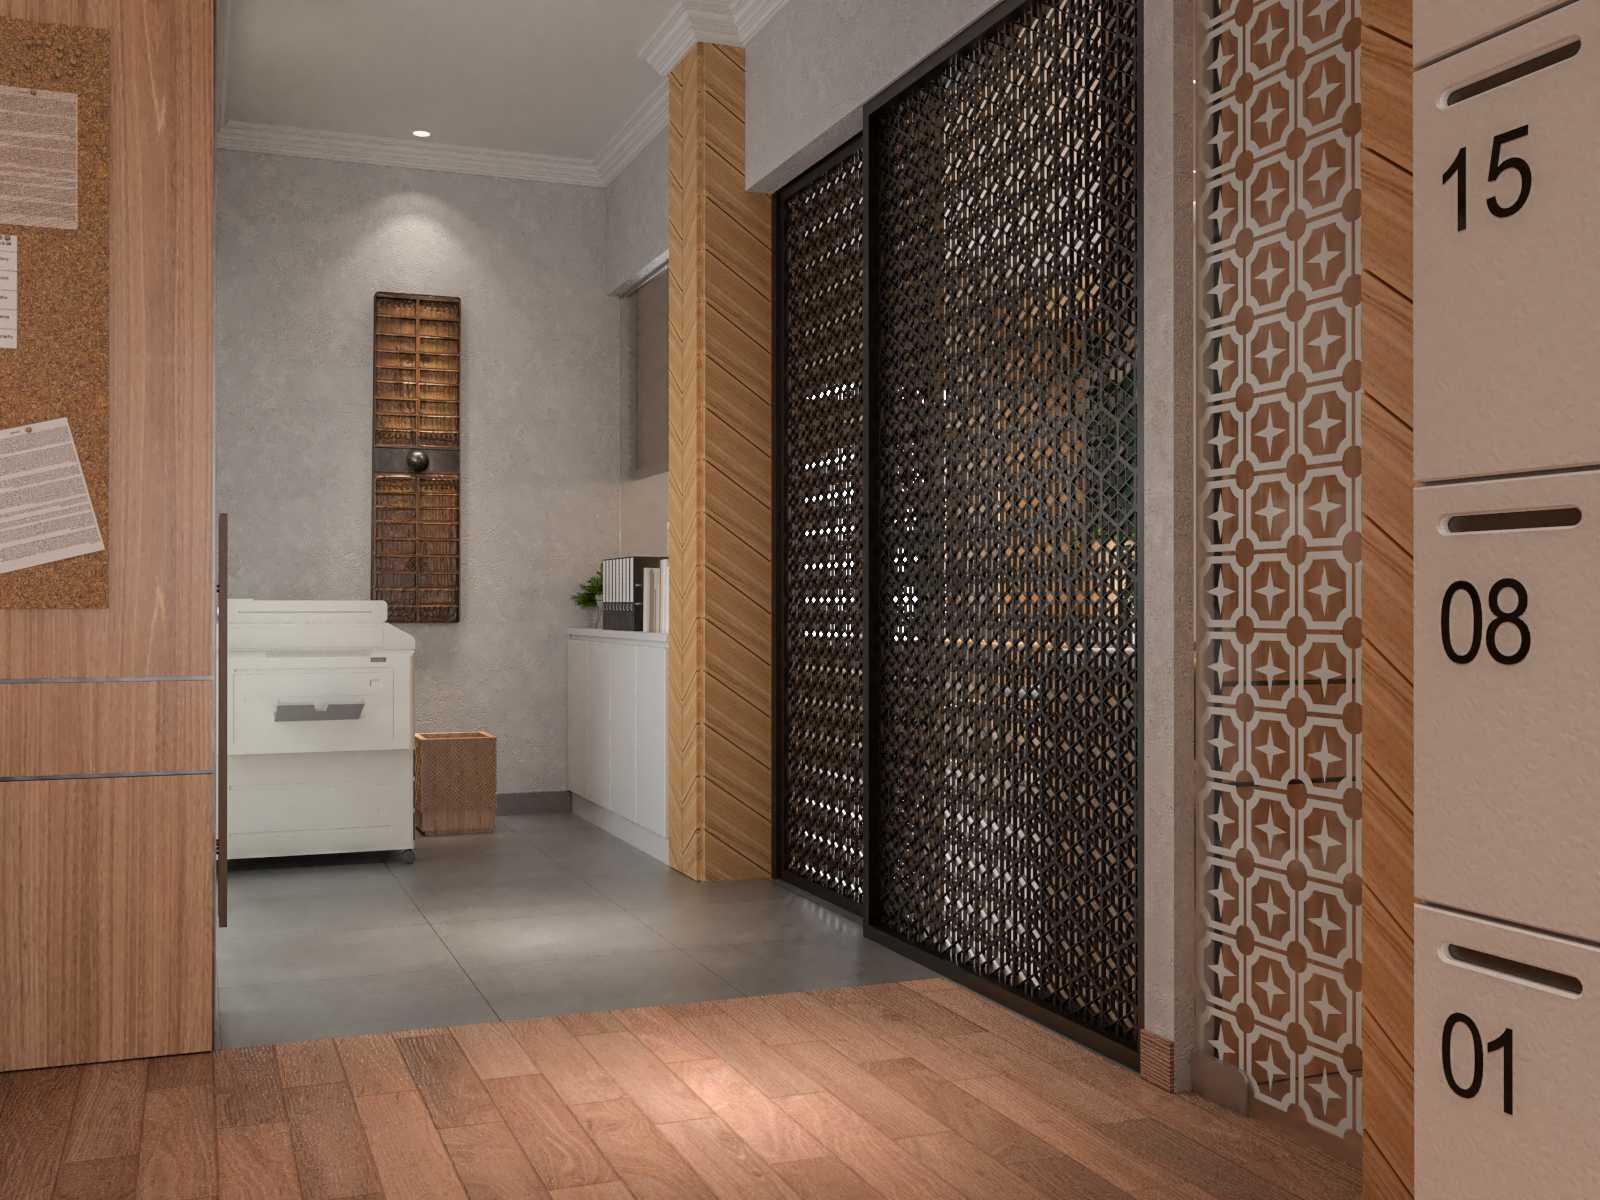 Vindo Design Modern Ethnic Office Jayapura, Kota Jayapura, Papua, Indonesia Jayapura, Kota Jayapura, Papua, Indonesia Vindo-Design-Modern-Ethnic-Office  66588